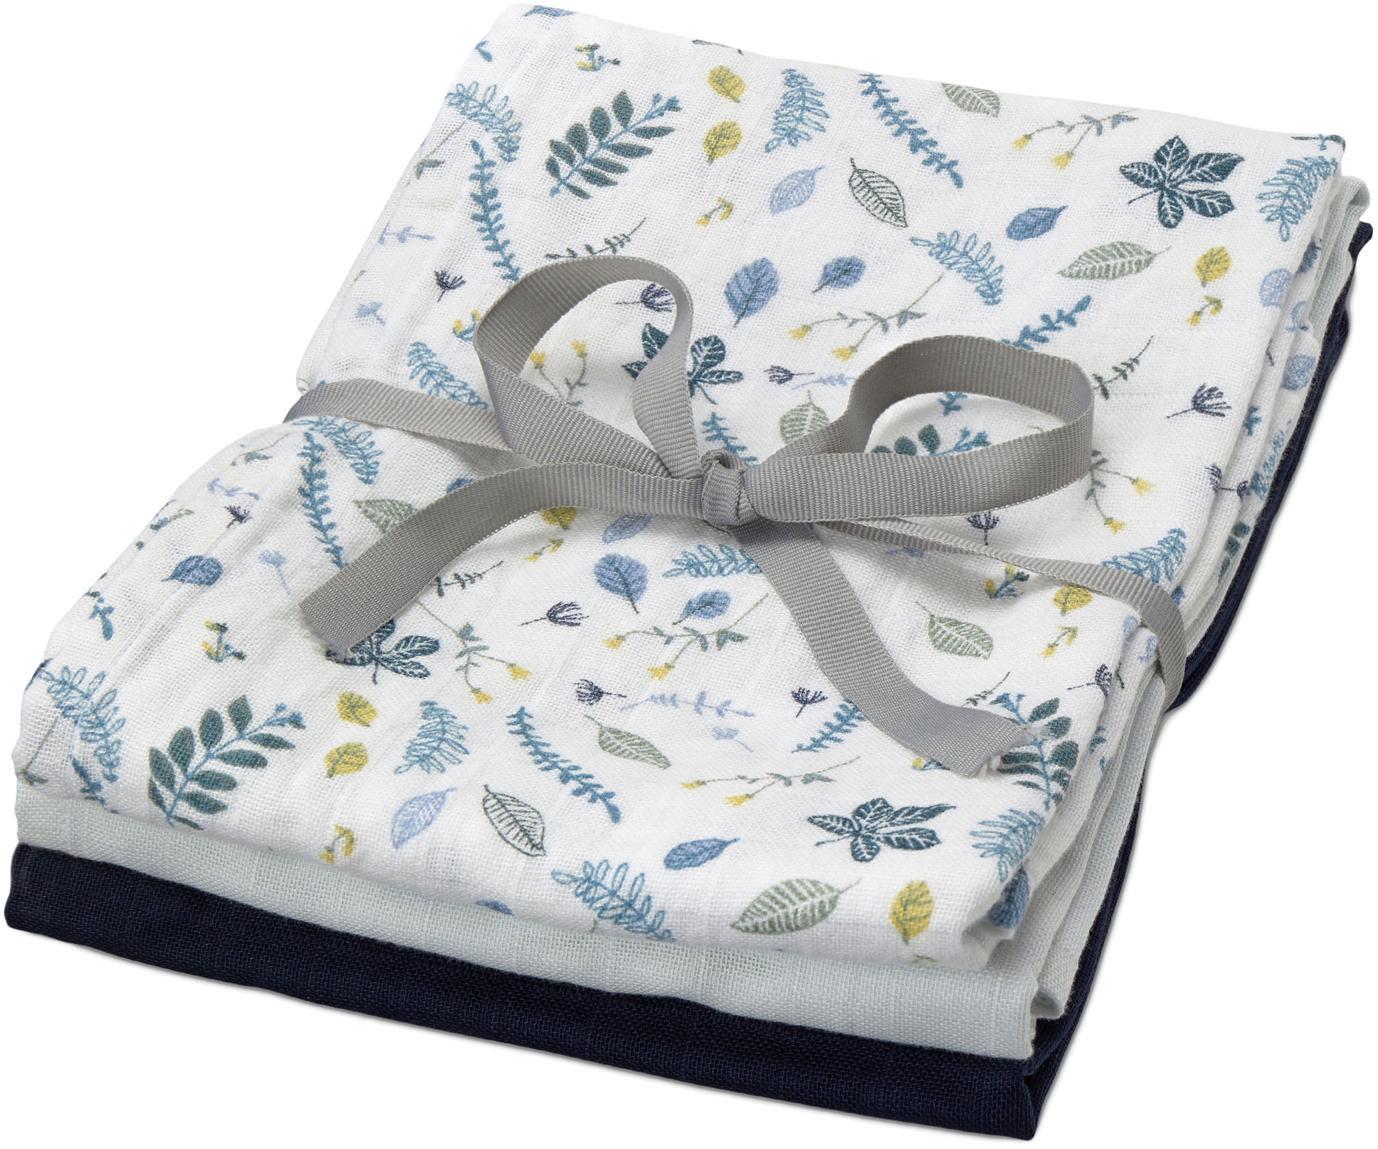 Set pañales de tela Pressed Leaves, 3pzas., Algodón orgánico, Blanco, azul, gris, amarillo, azul claro, azul oscuro, An 70 x L 70 cm